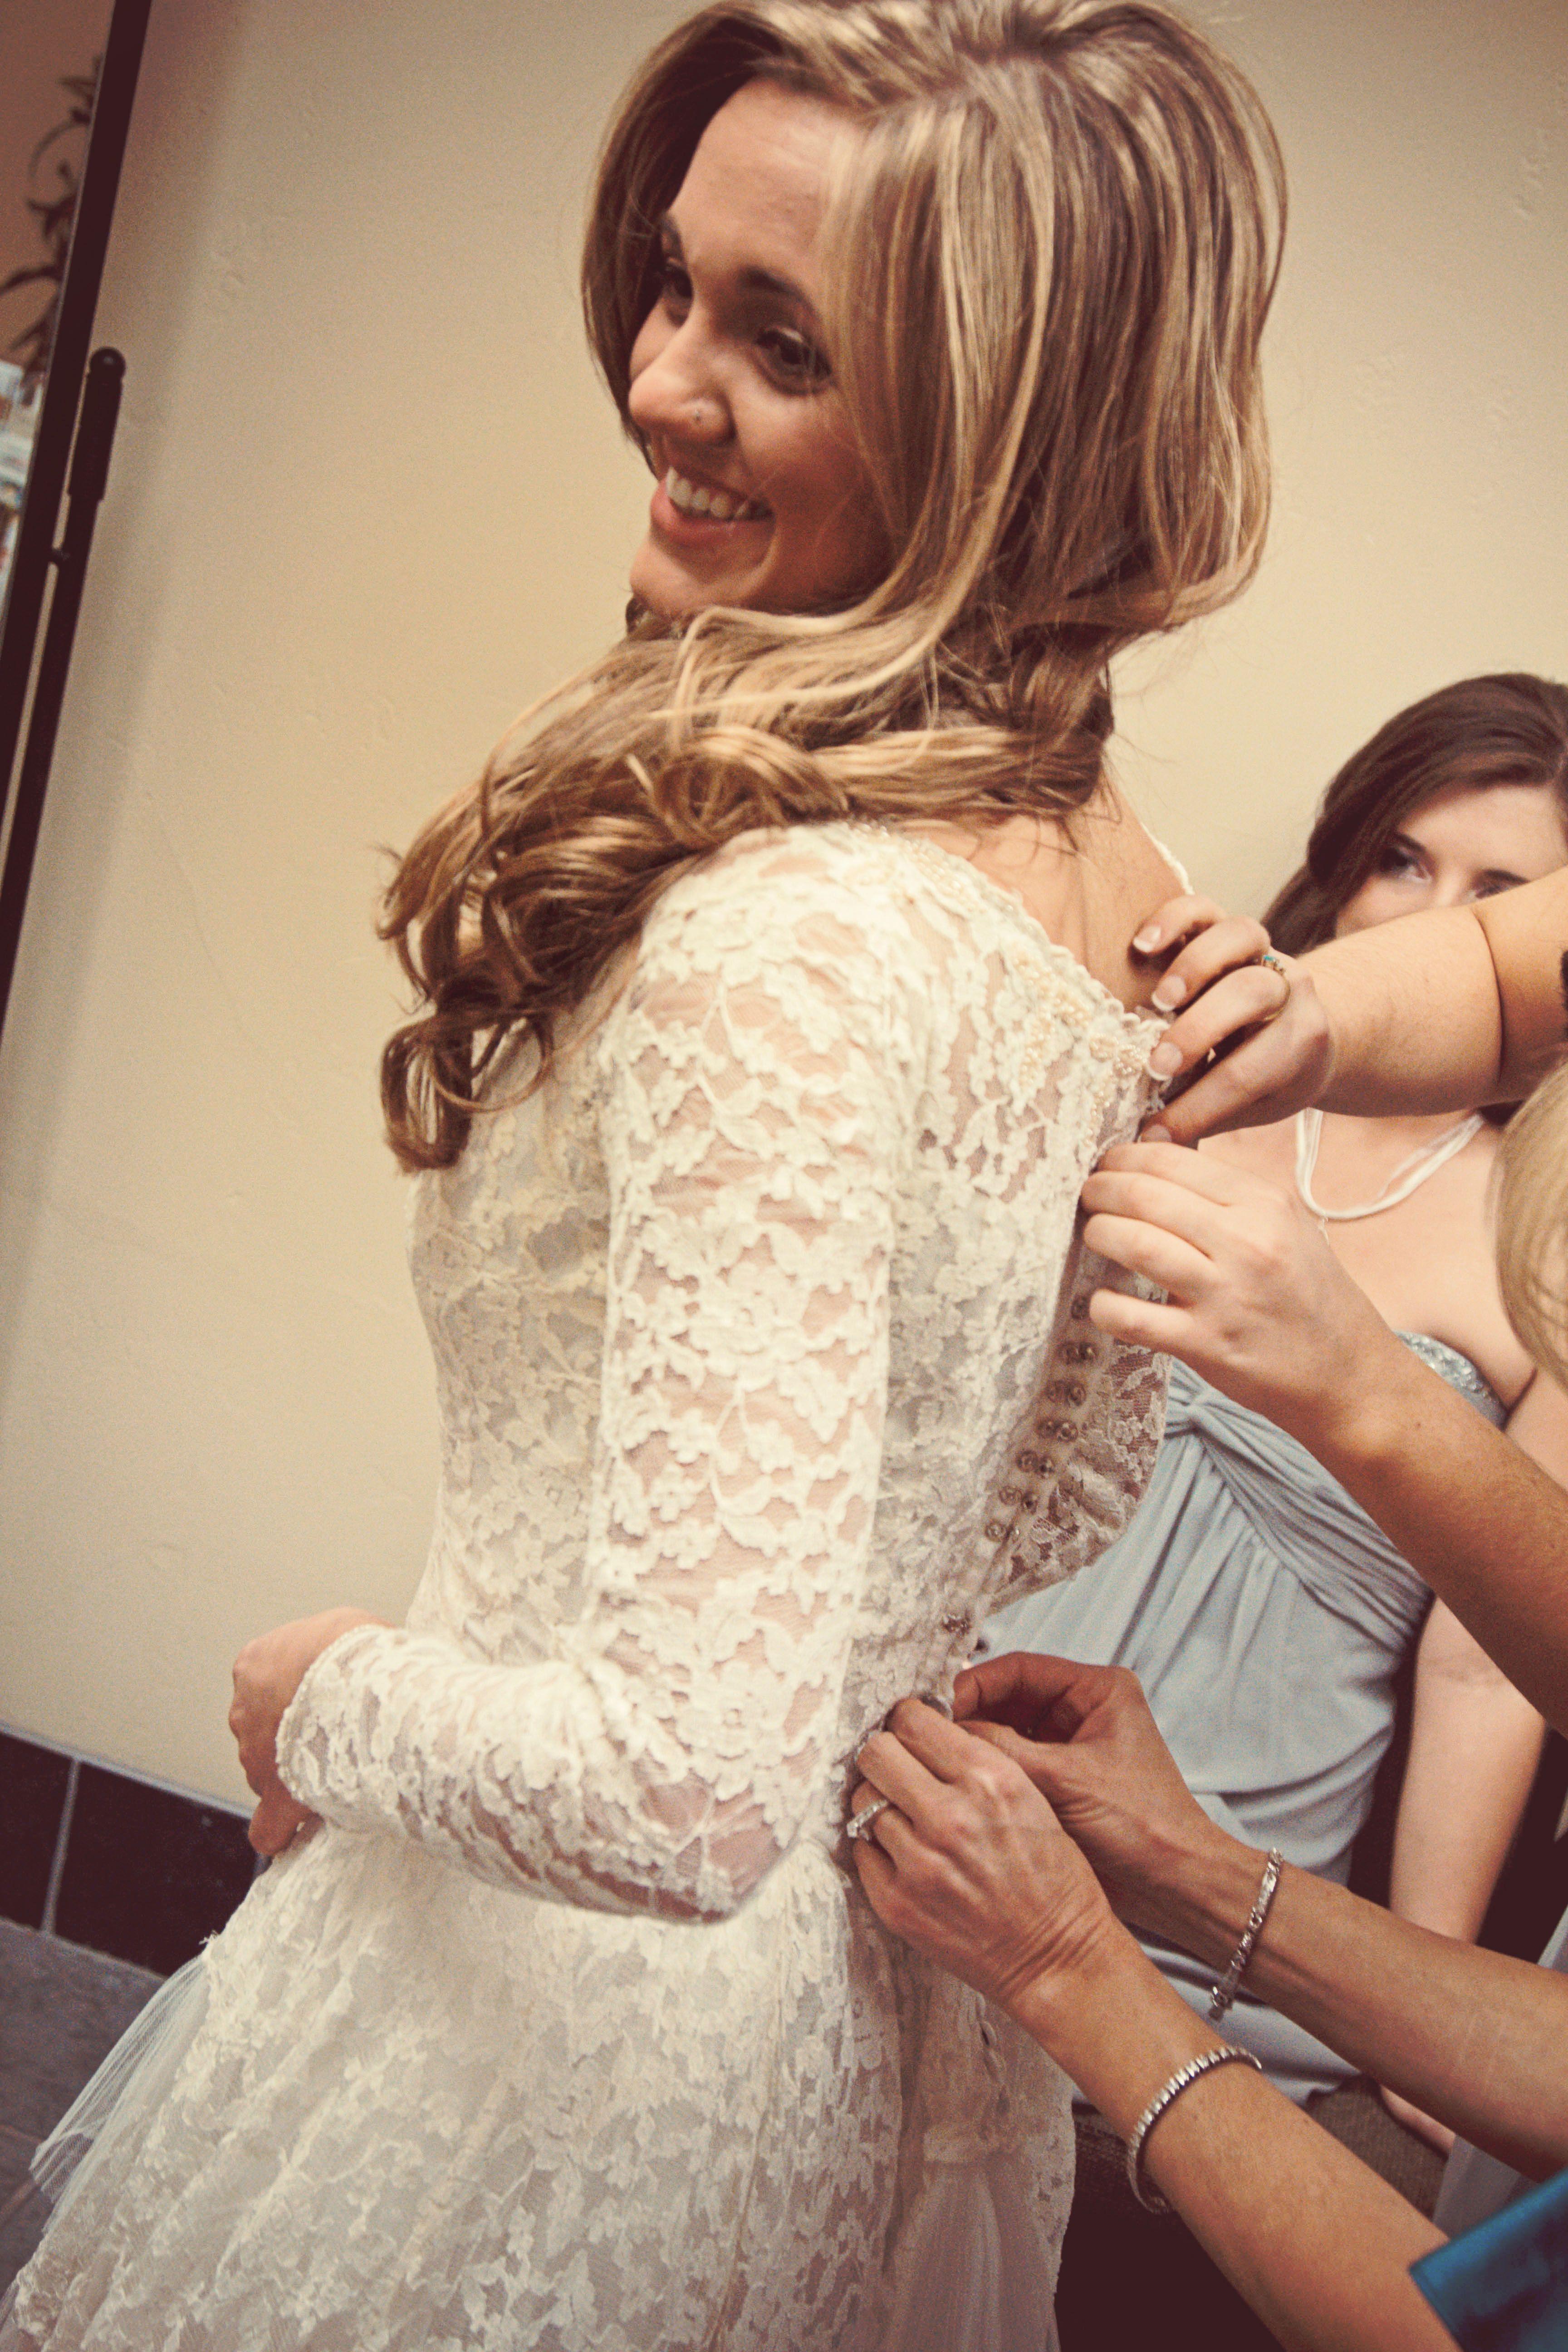 Vintage lace wedding dress. Bride getting ready. Lace